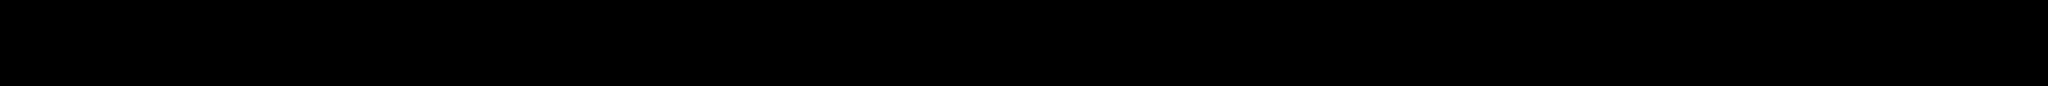 TRUCKTEC AUTOMOTIVE 000 501 6215, 123 501 0015, 123 501 0115, 123 501 0215, 123 501 1715 Verschlußdeckel, Kühlmittelbehälter